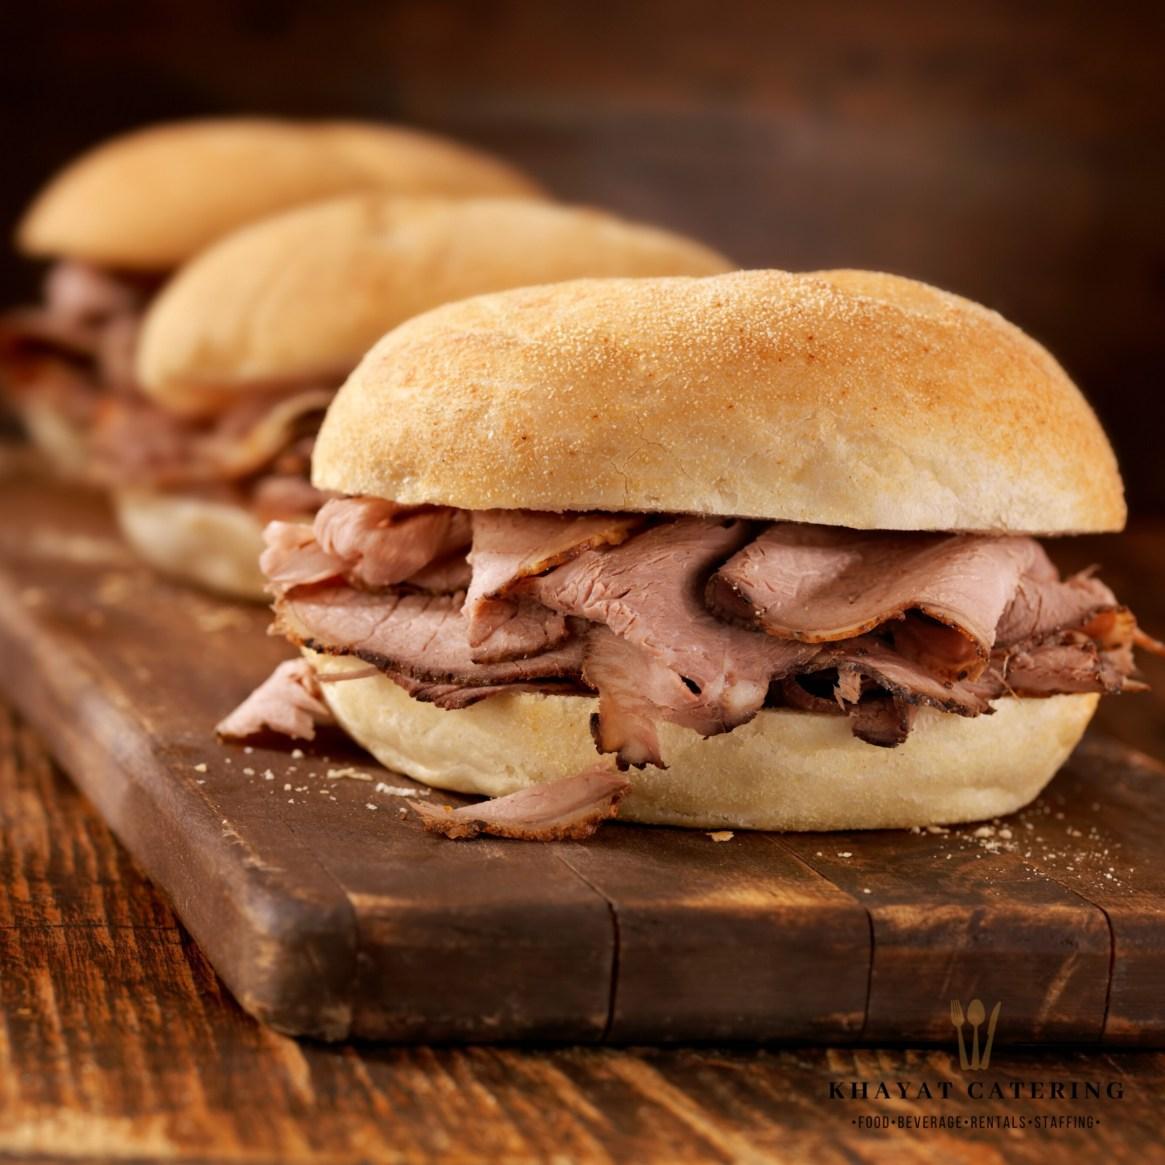 Khayat Catering shaved Prime rib sandwich